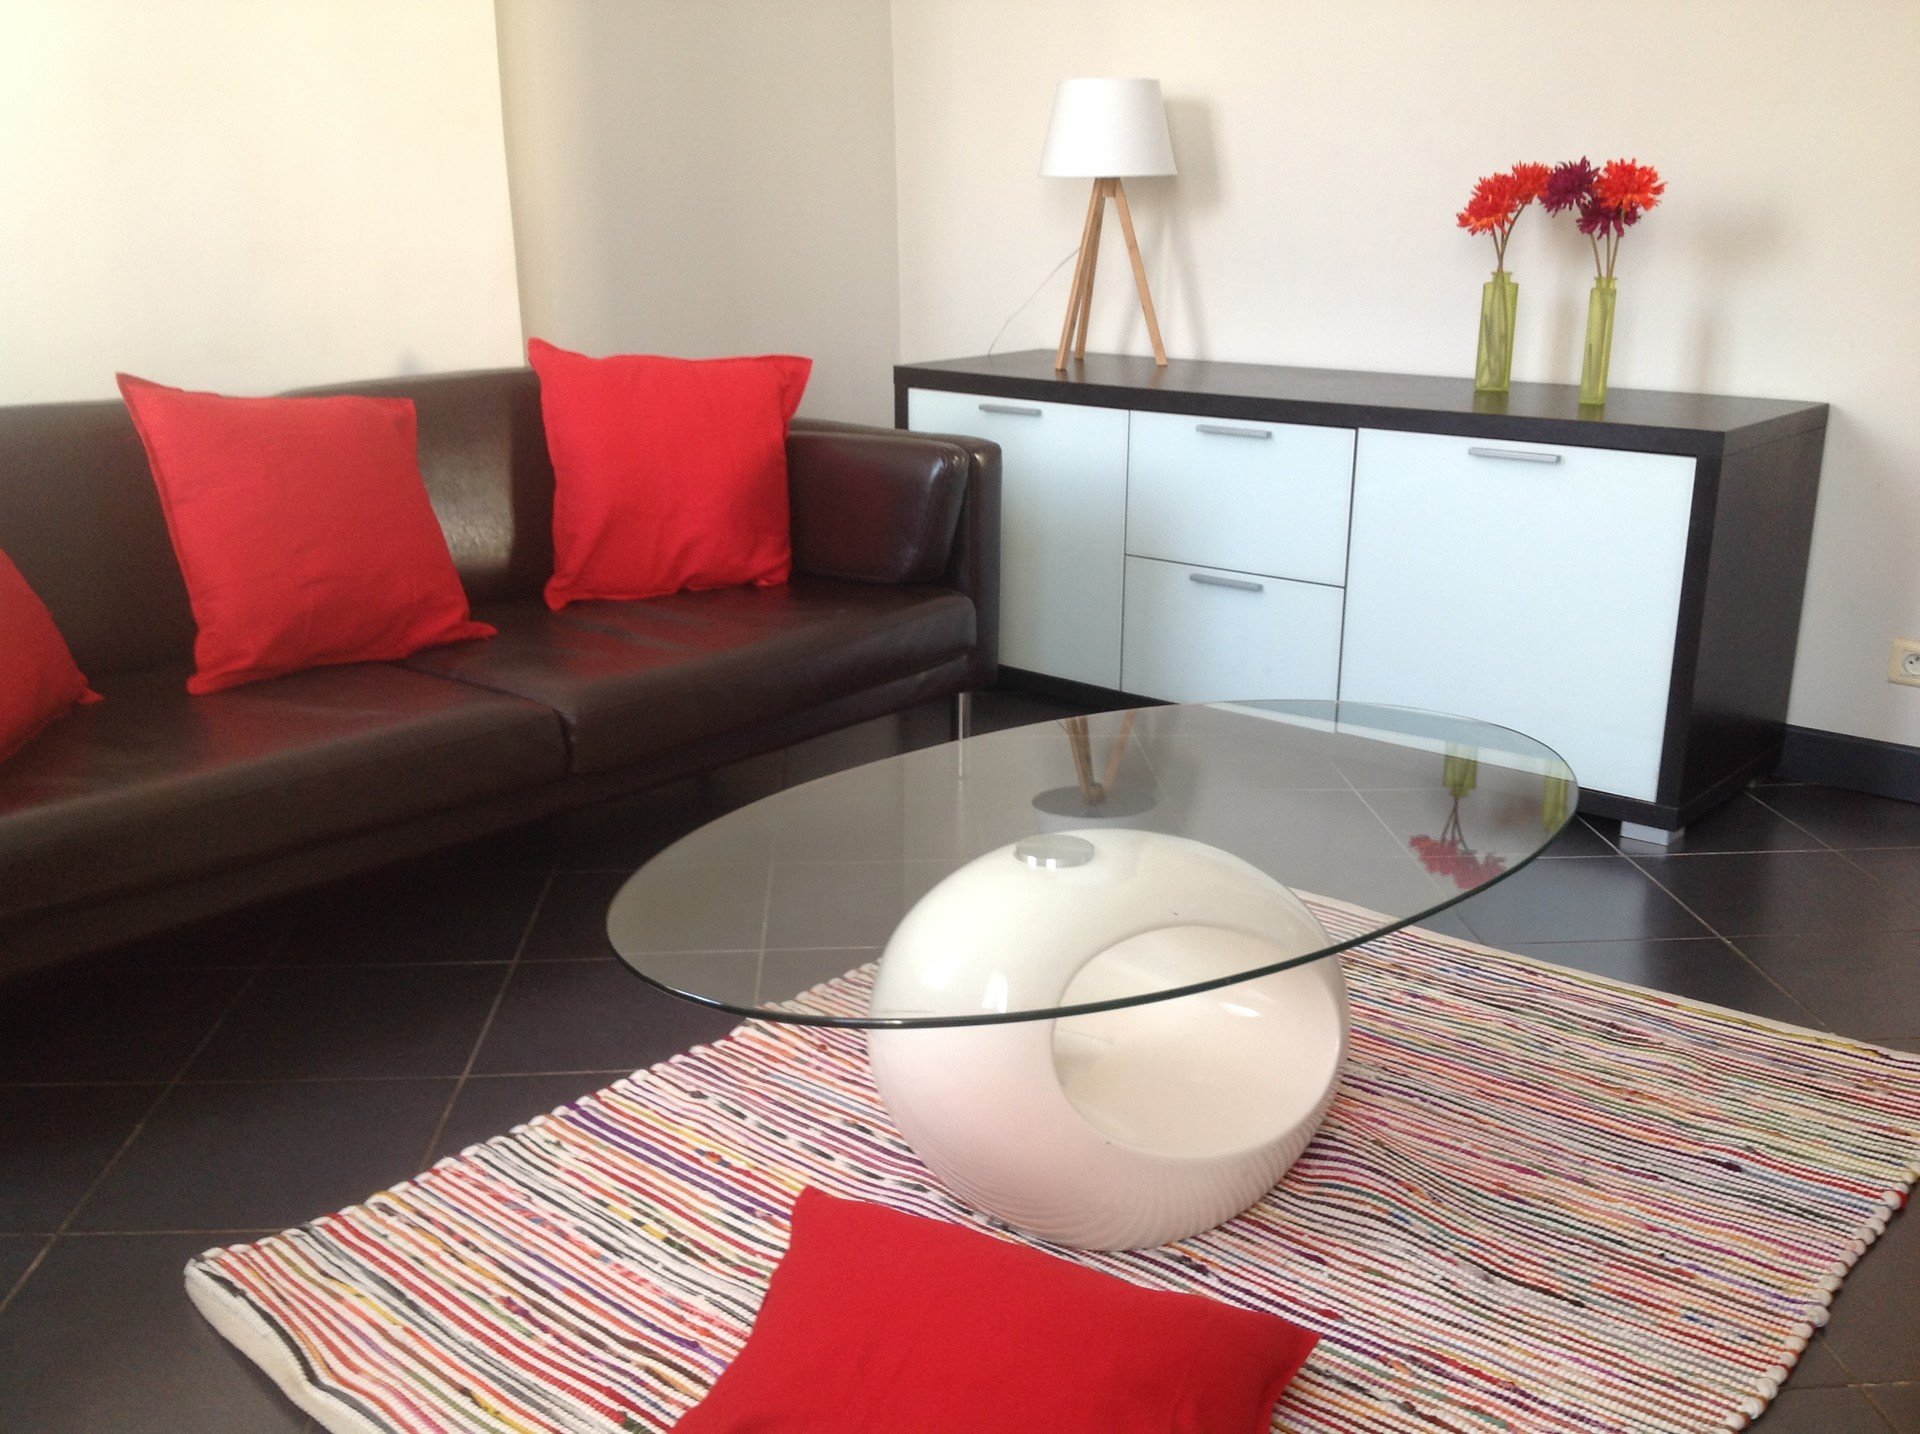 t2-meuble-vauban-ensoleille-92ba2806f29e7dbe47fae8f4feca380c